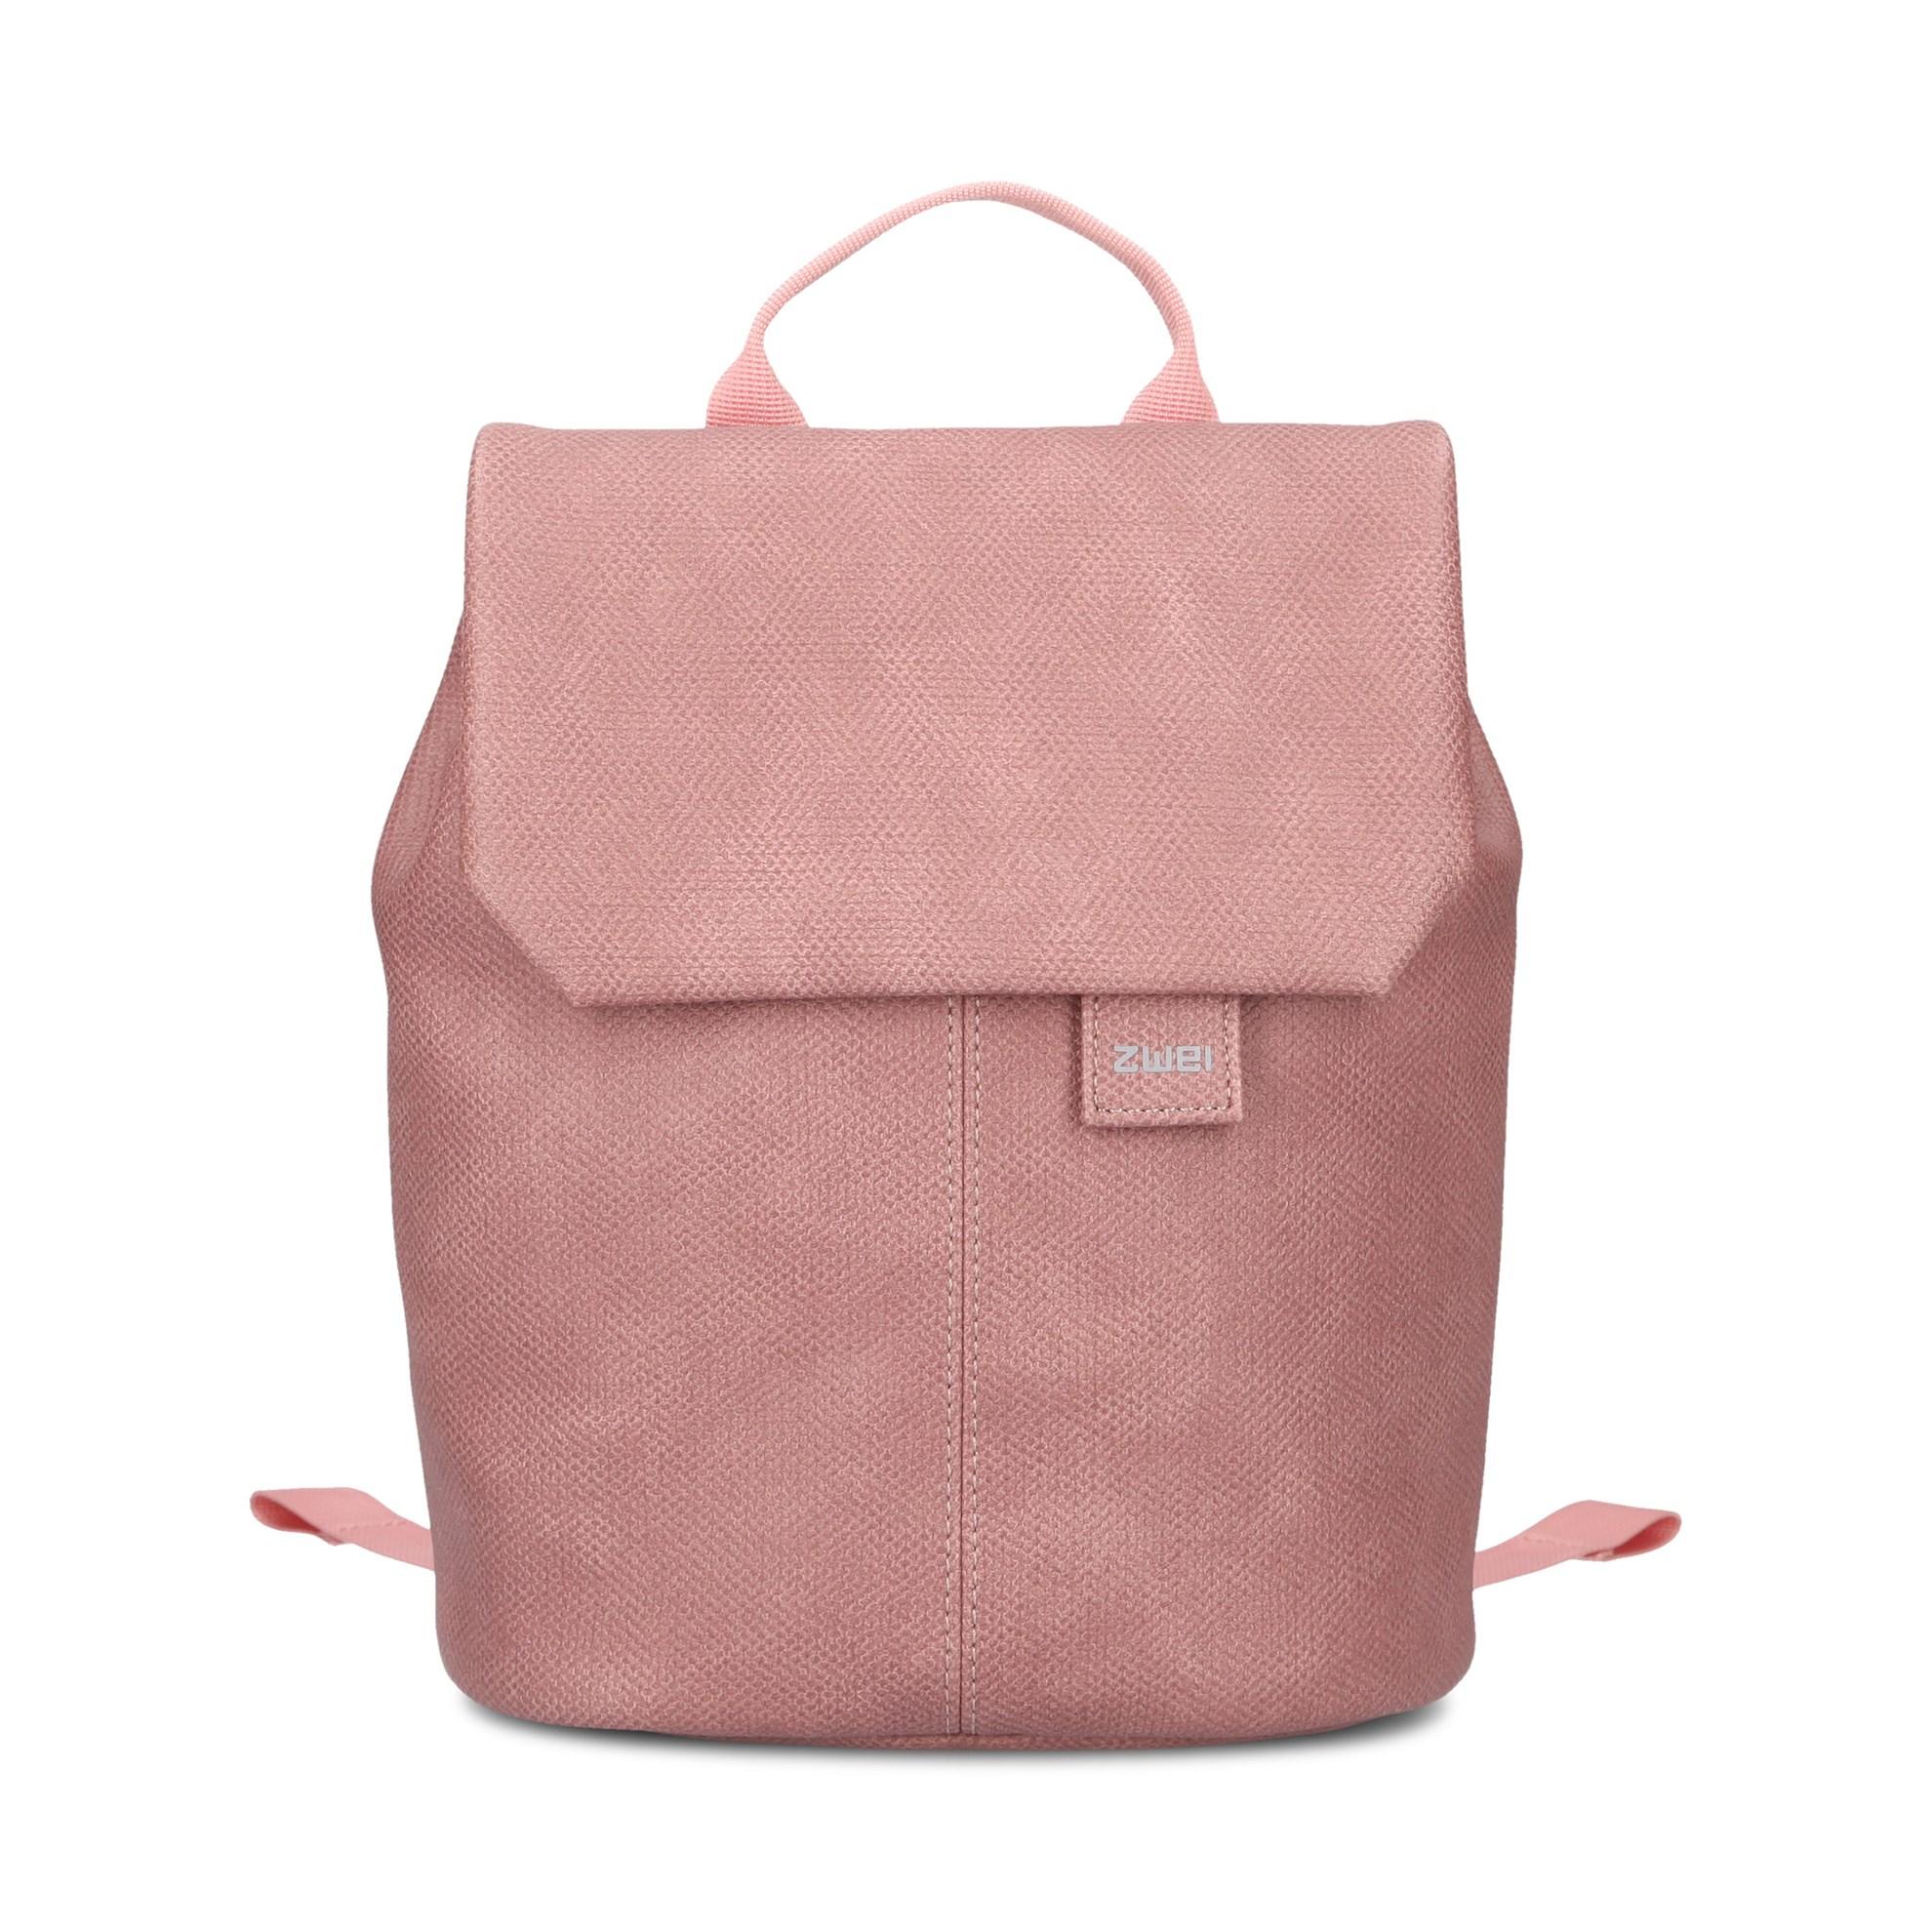 Dětský batoh ZWEI MADEMOISELLE MKR30_3